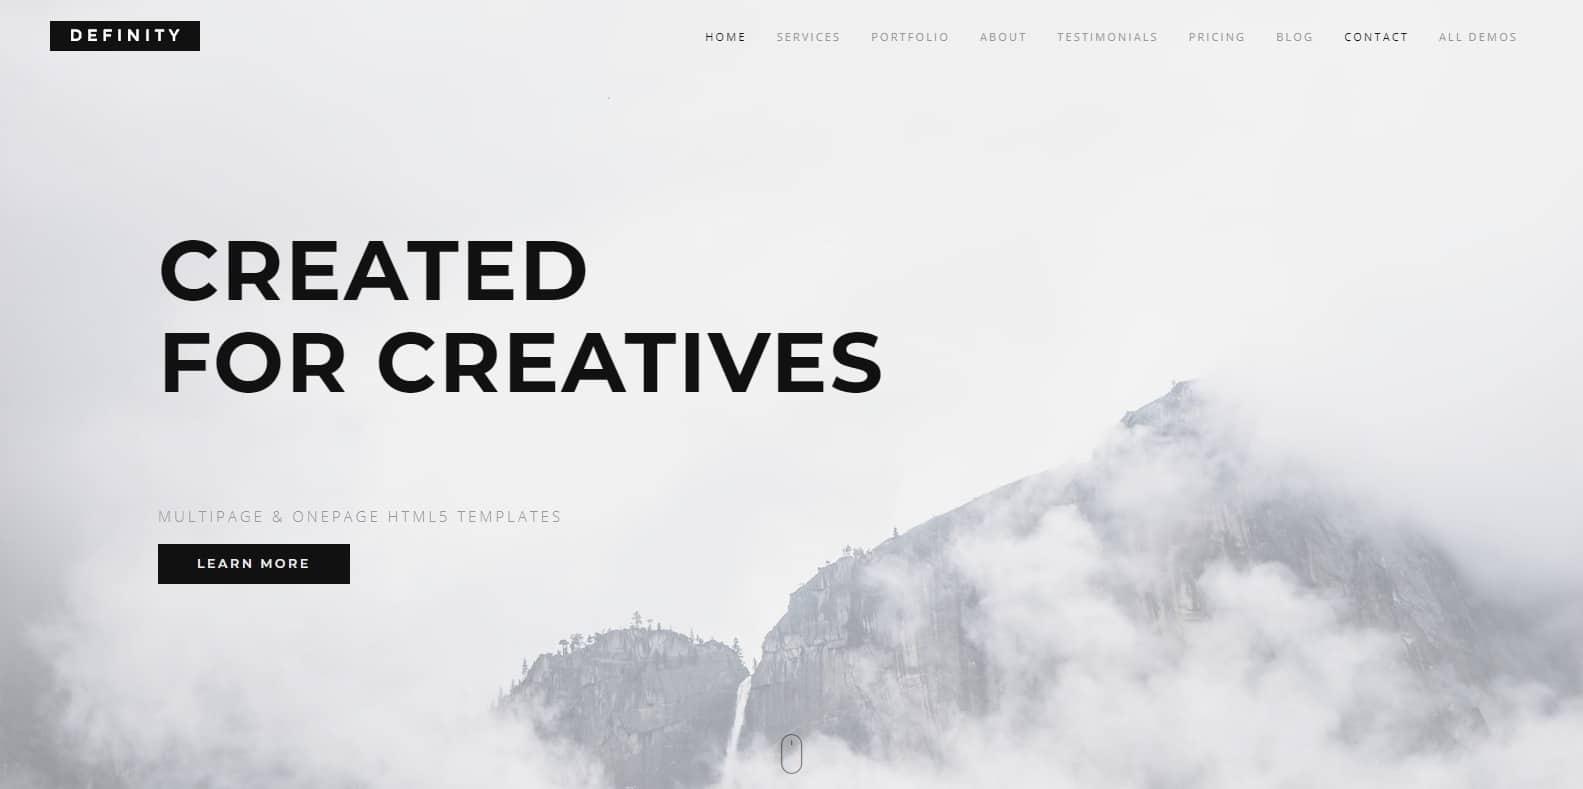 definity-blog-website-template